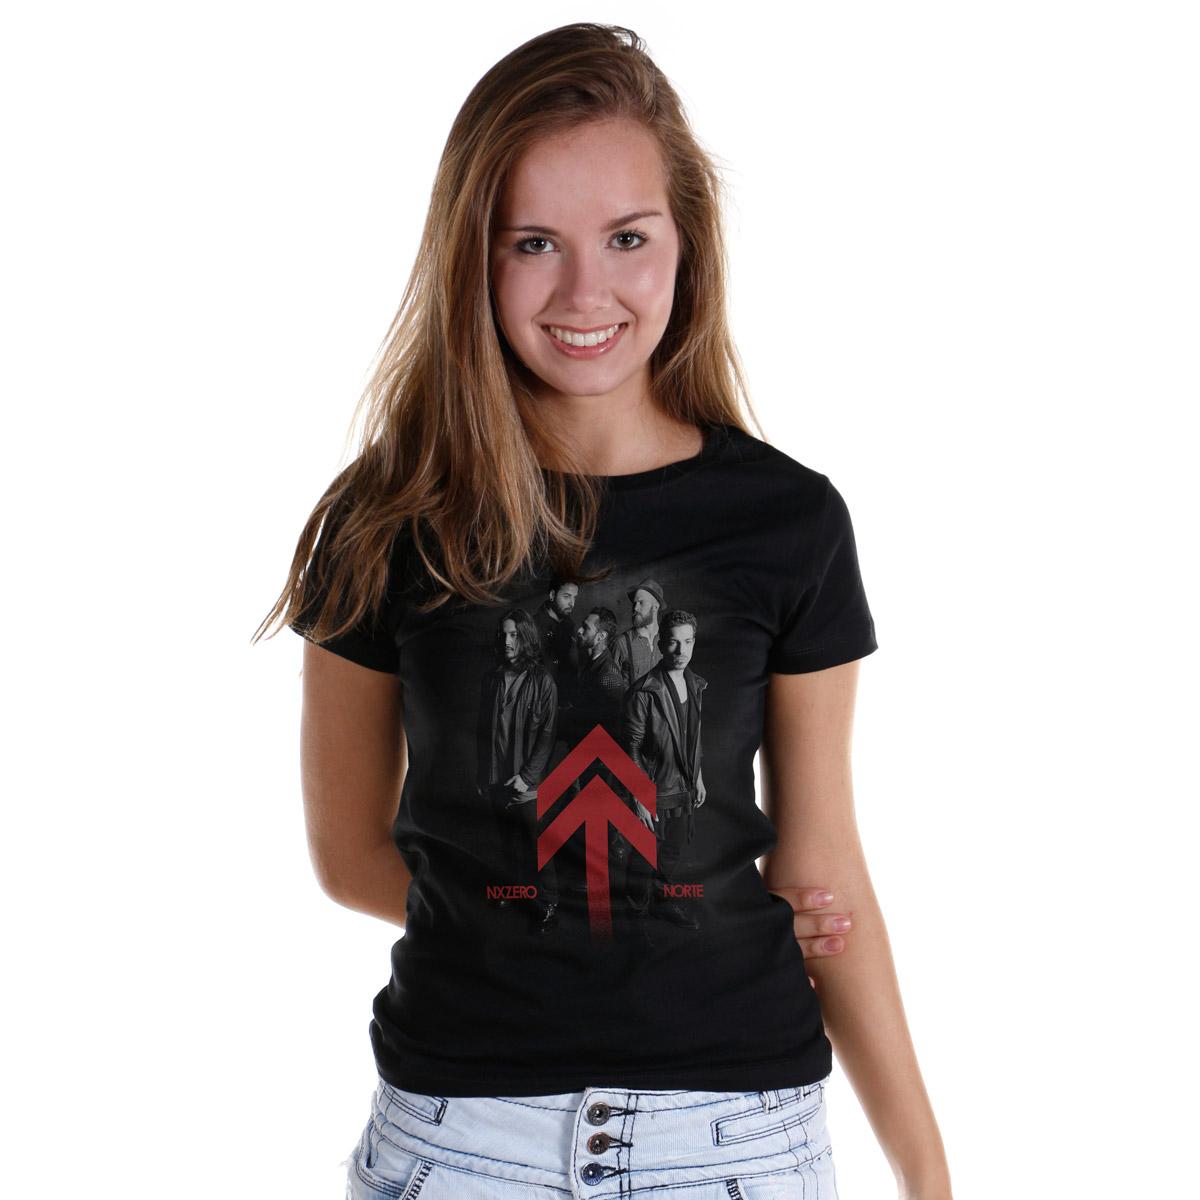 Camiseta Feminina NXZero Norte Foto